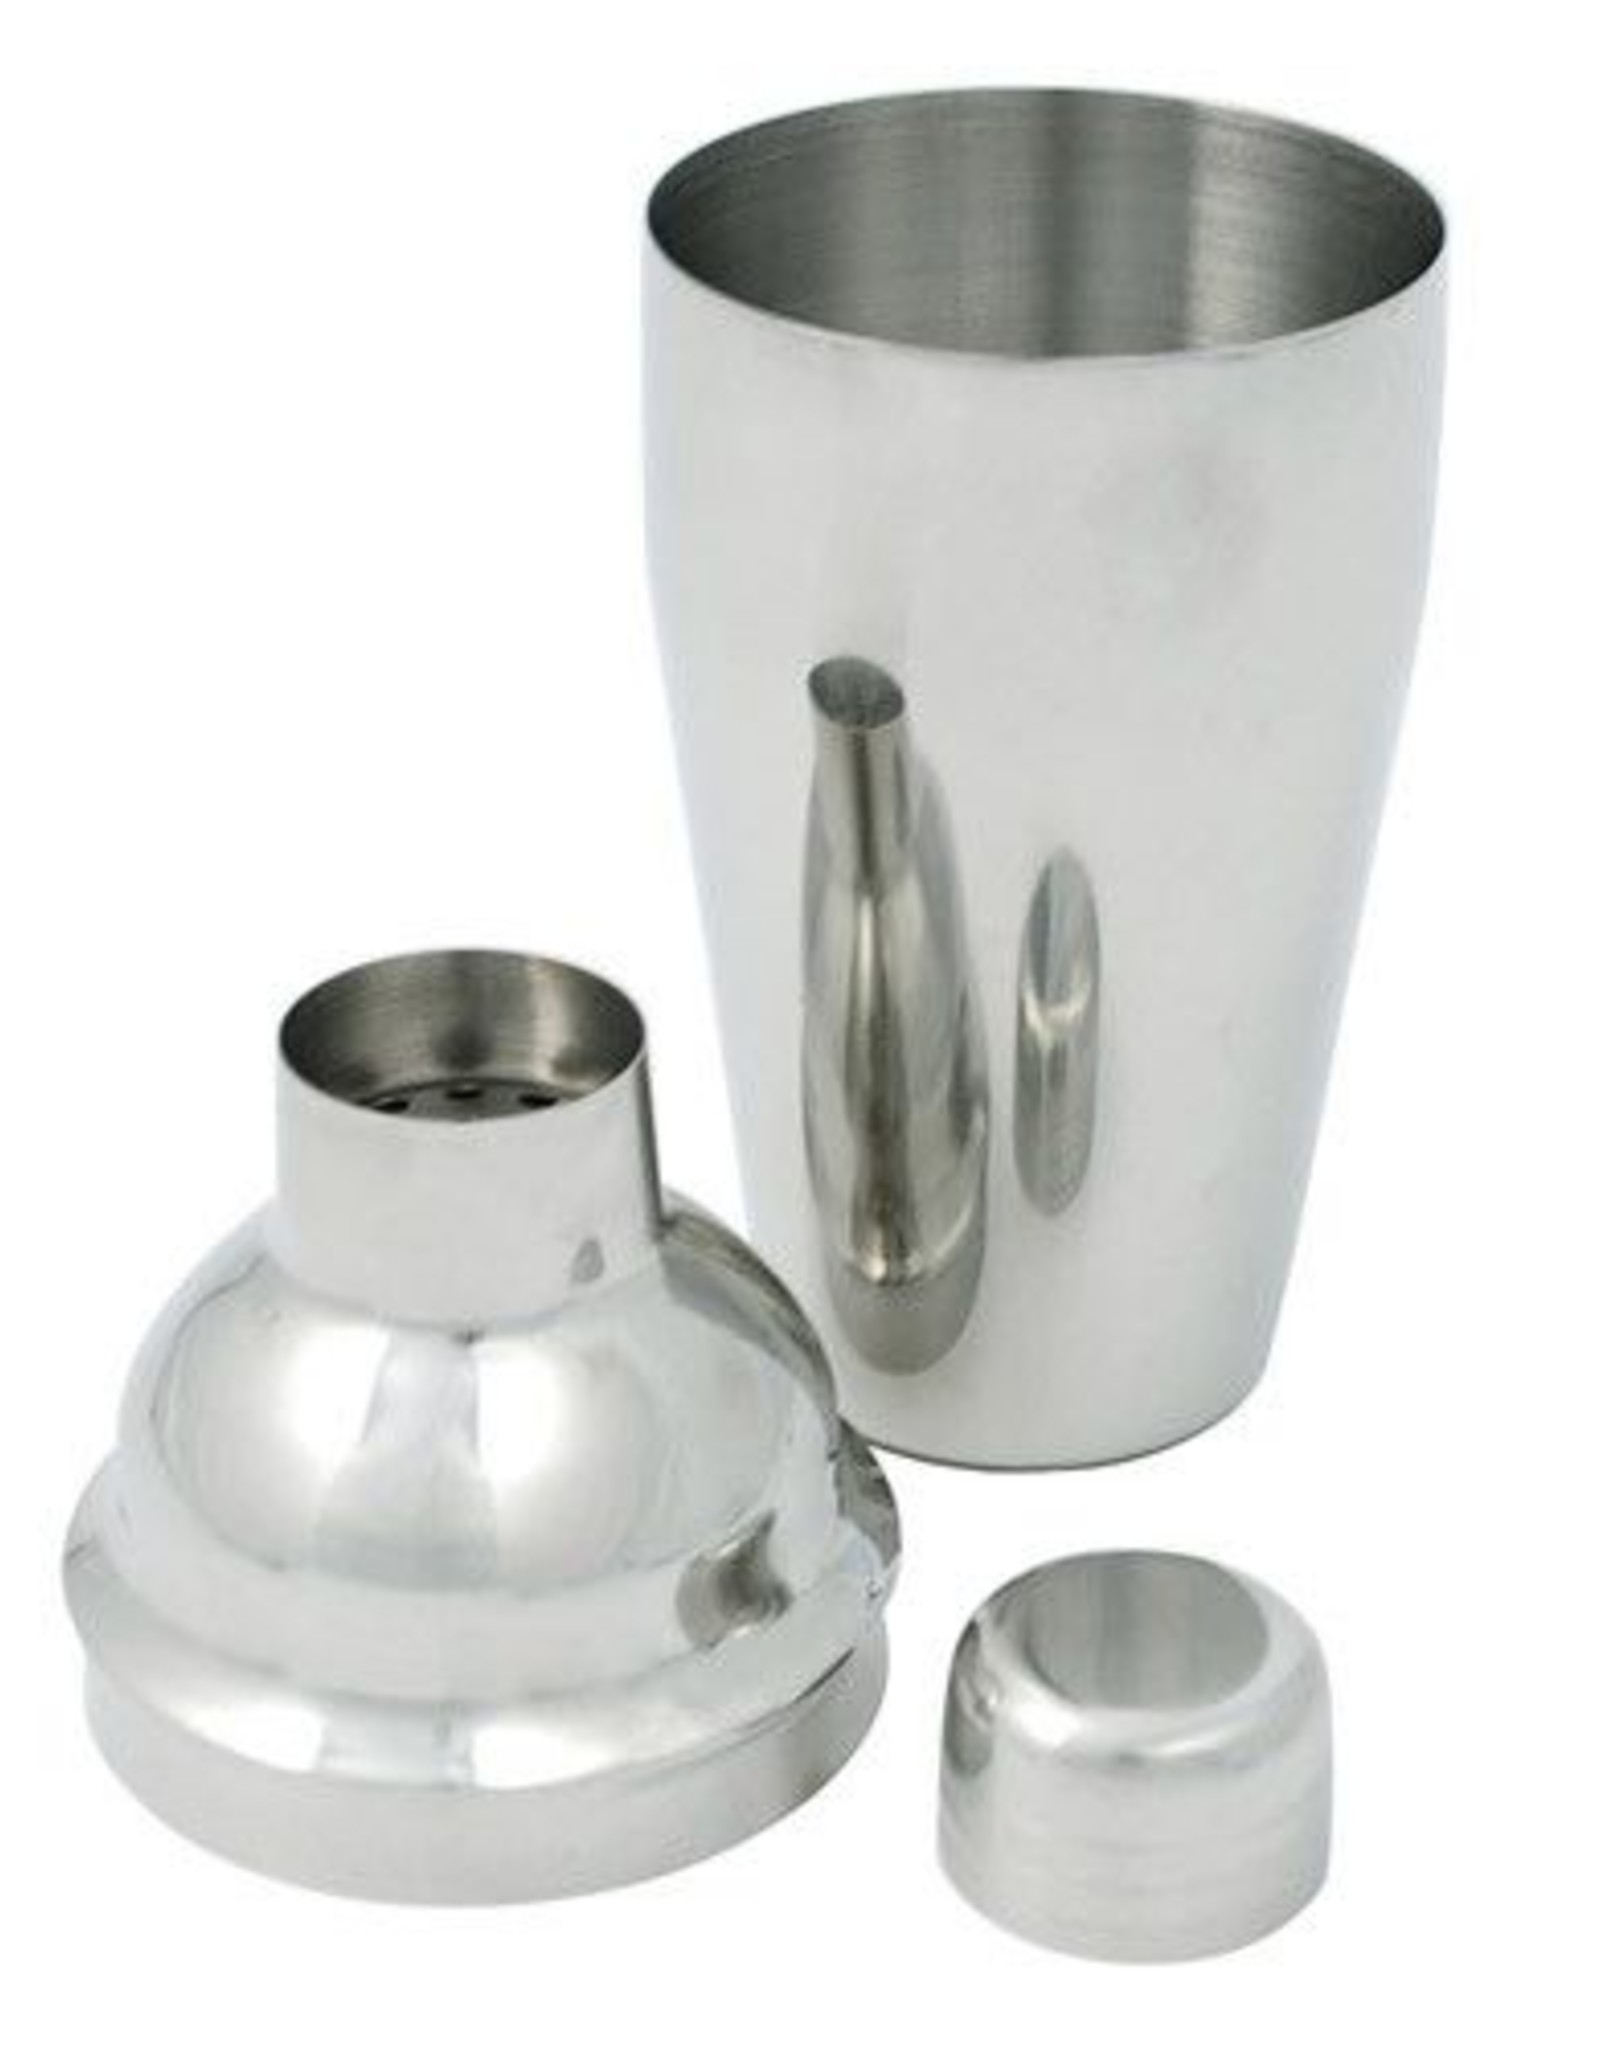 True Brands Contour Cocktail Shaker